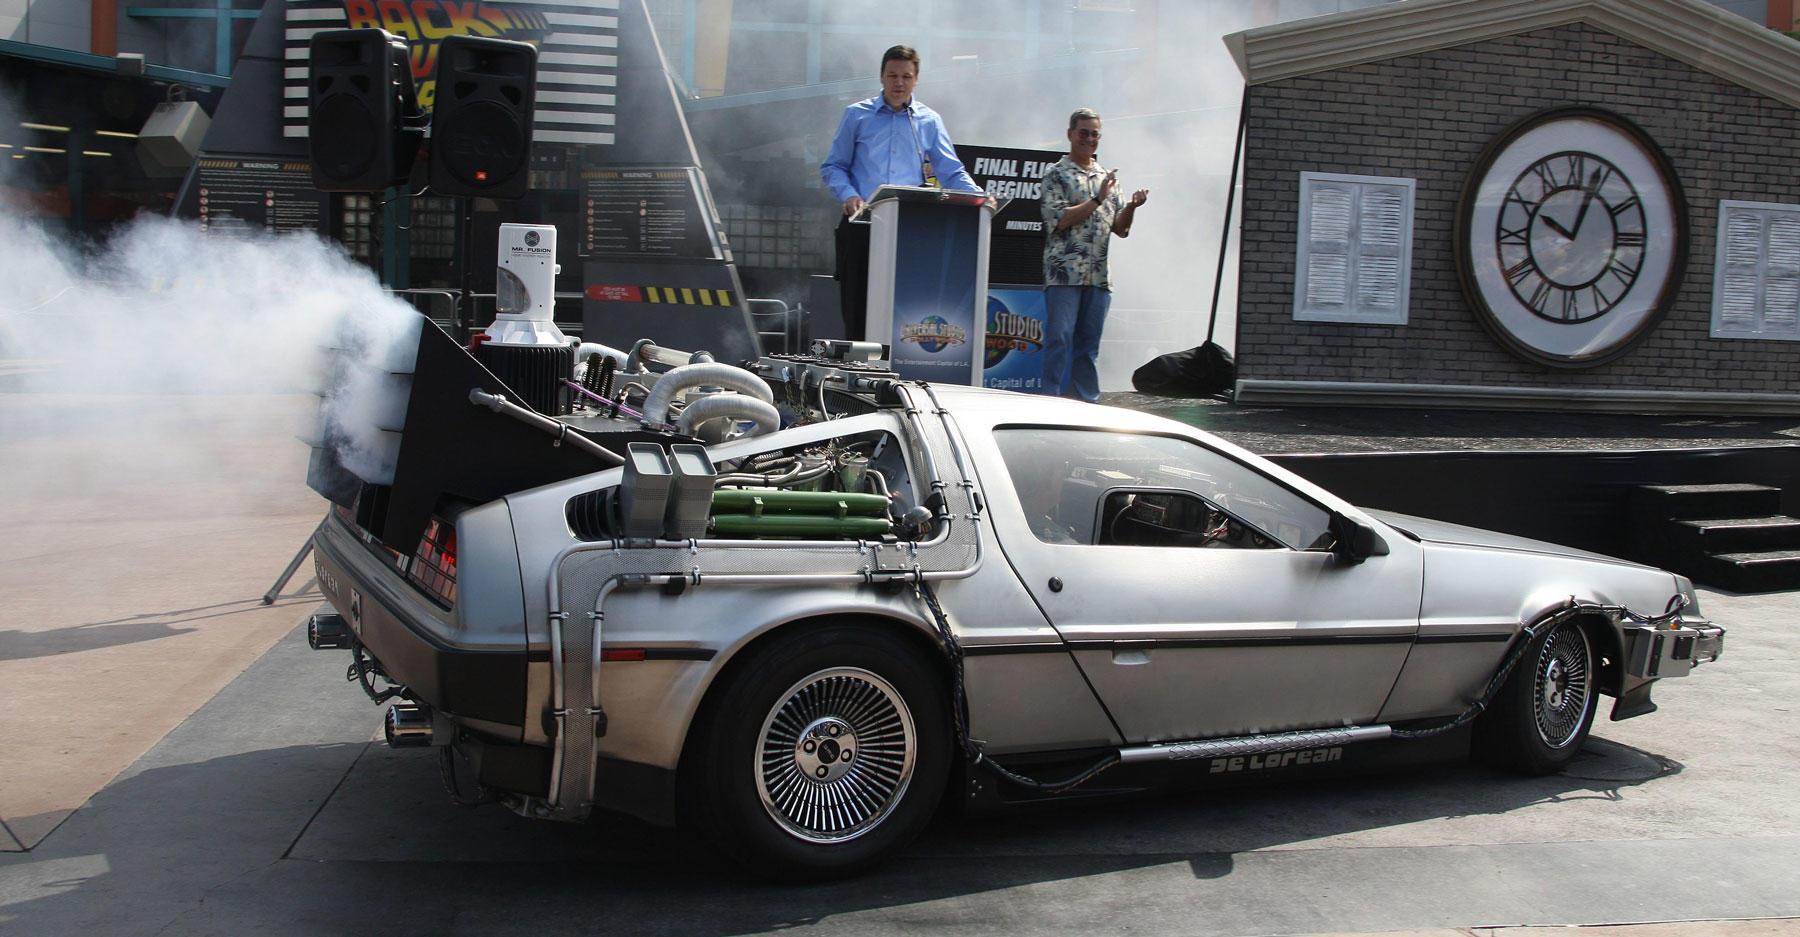 Christopher Lloyd arrives in a DeLorean